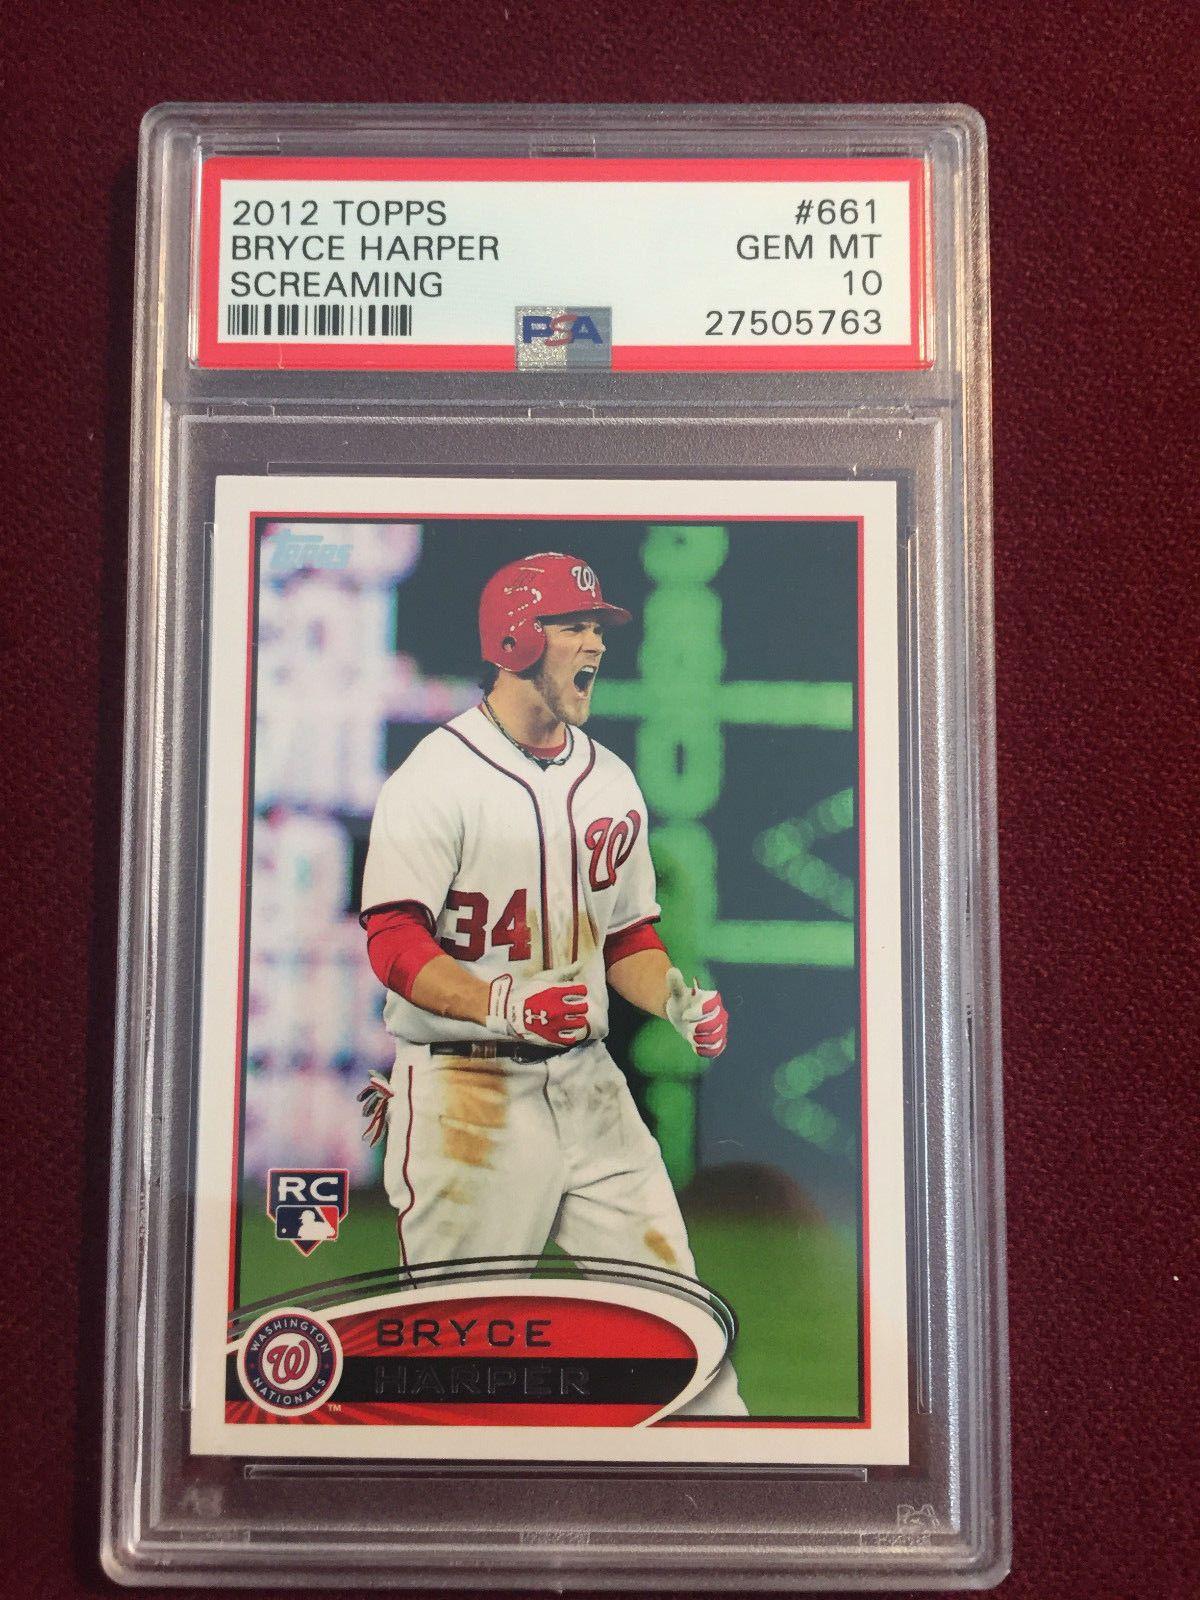 Bryce Harper 2012 Topps Short Print Screaming Rookie Card Rc